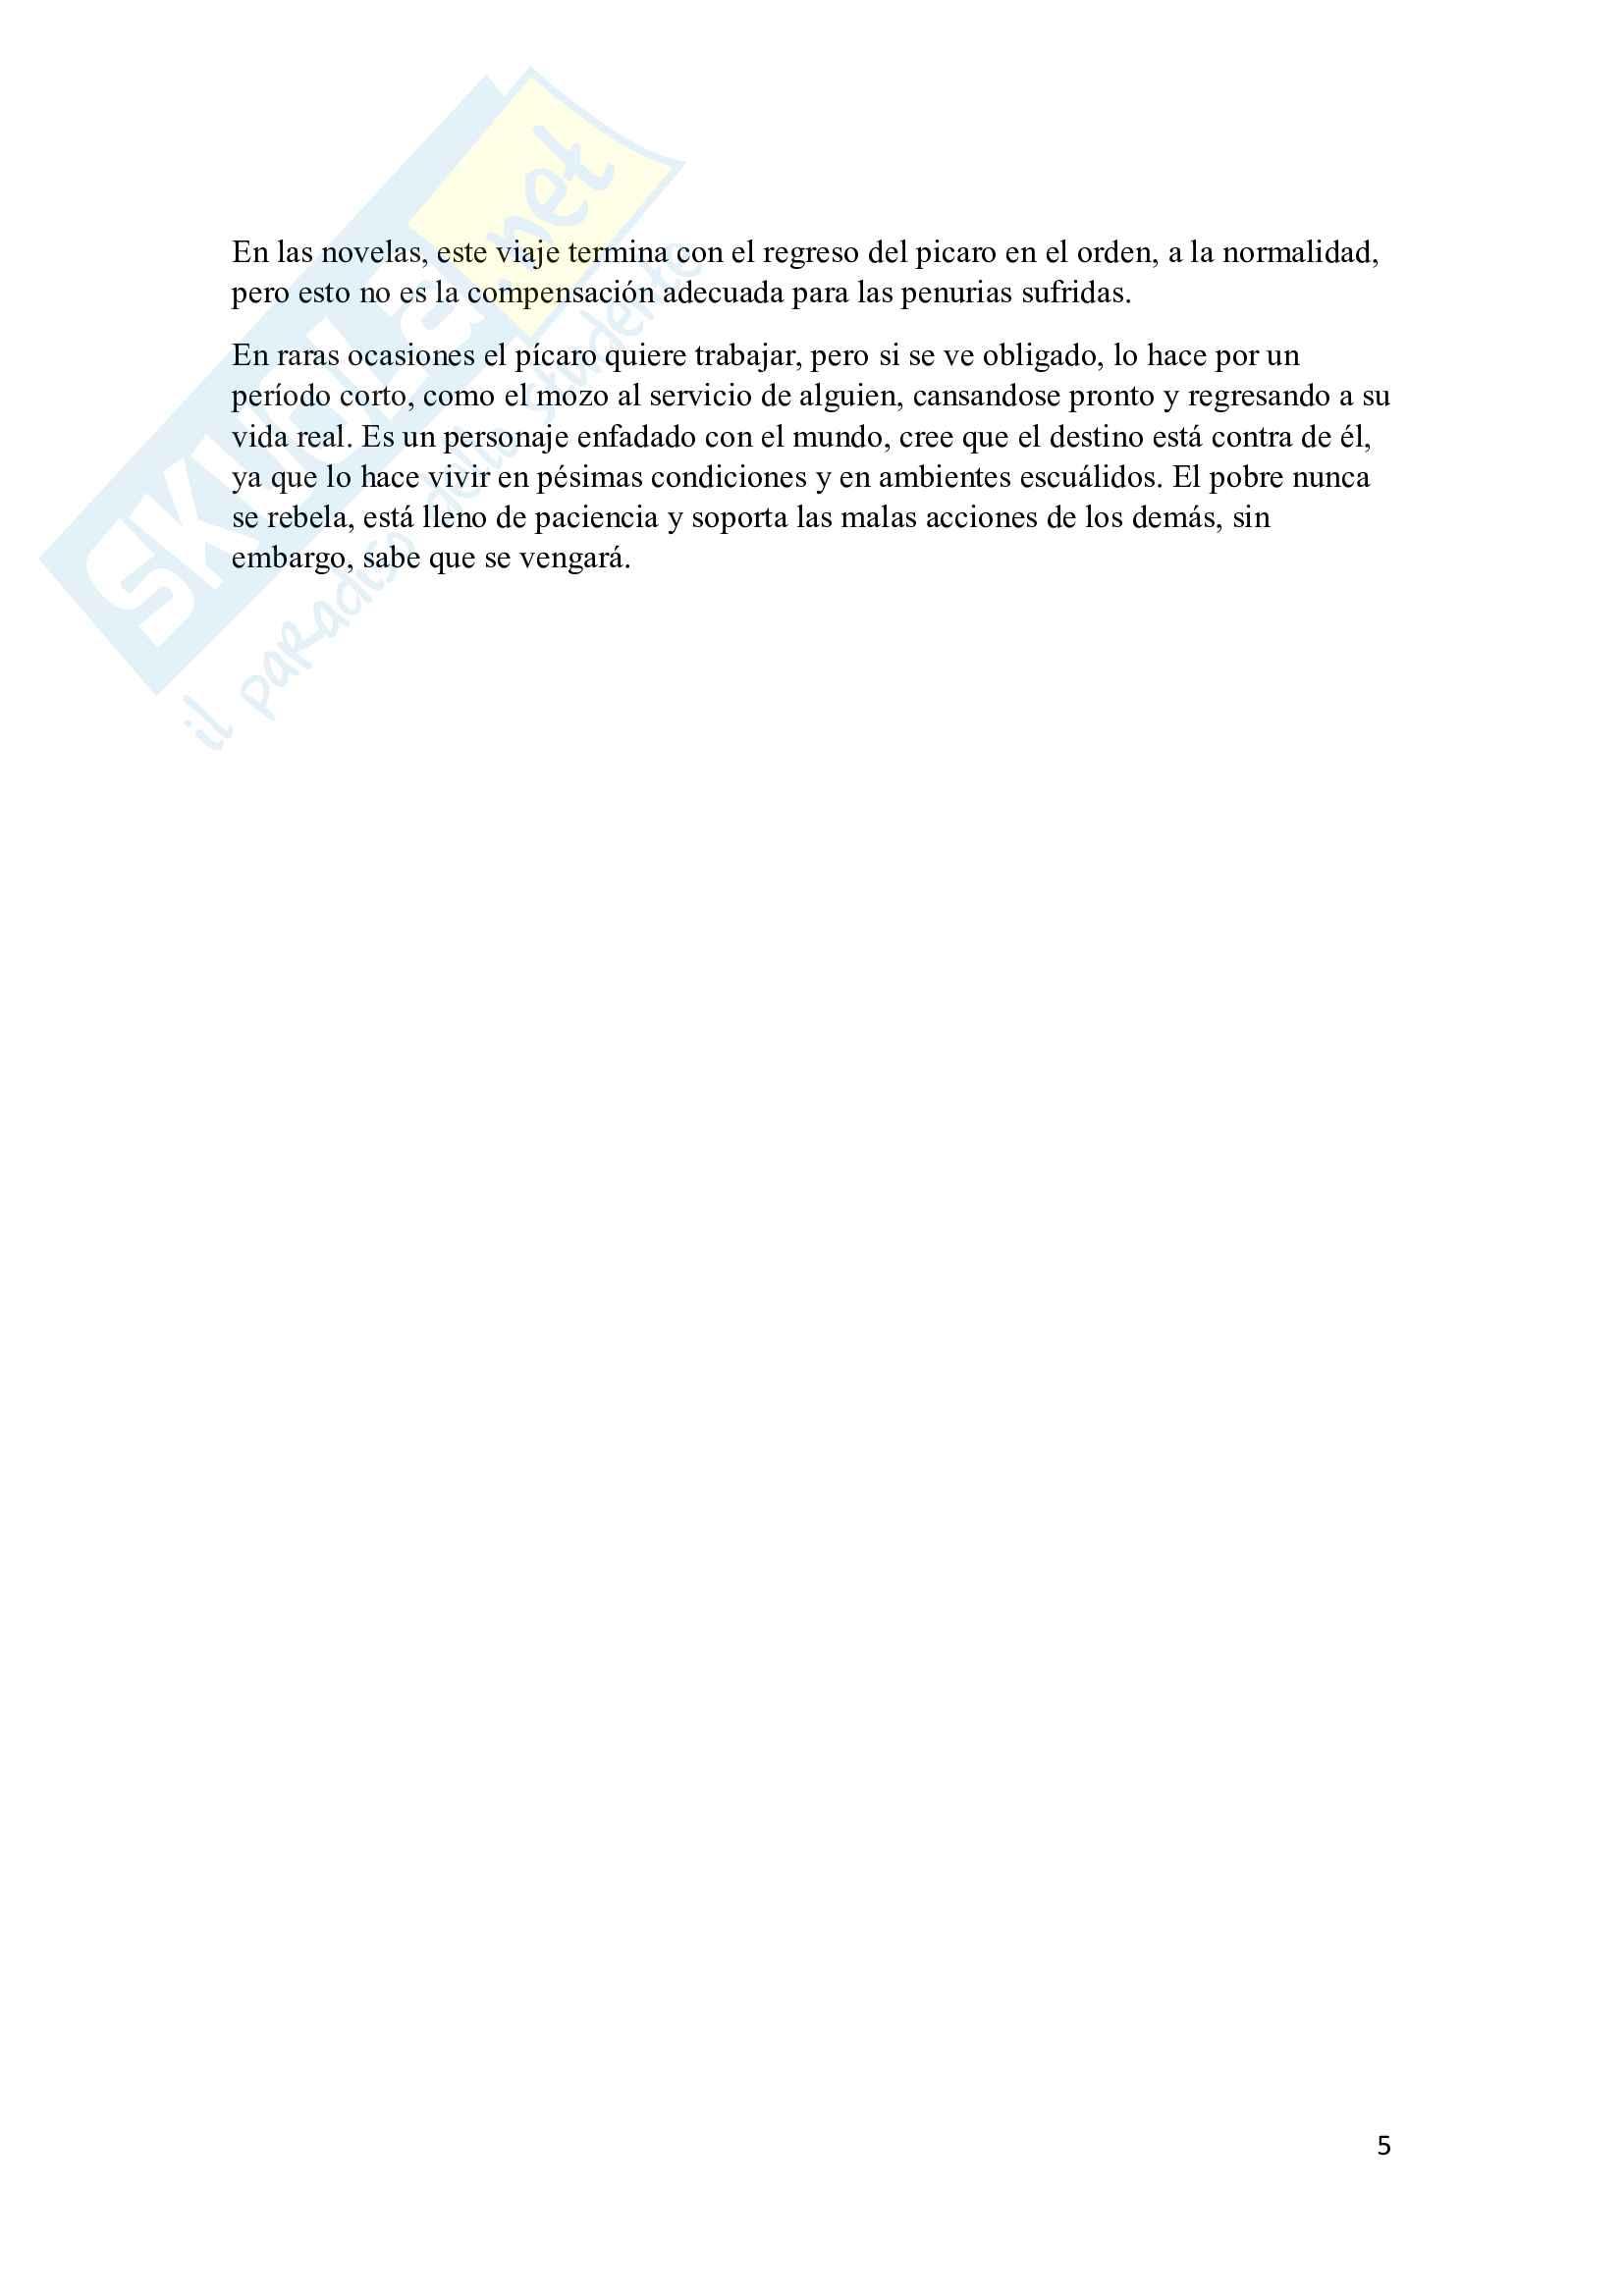 Mini tesi di letteratura spagnola Pag. 6